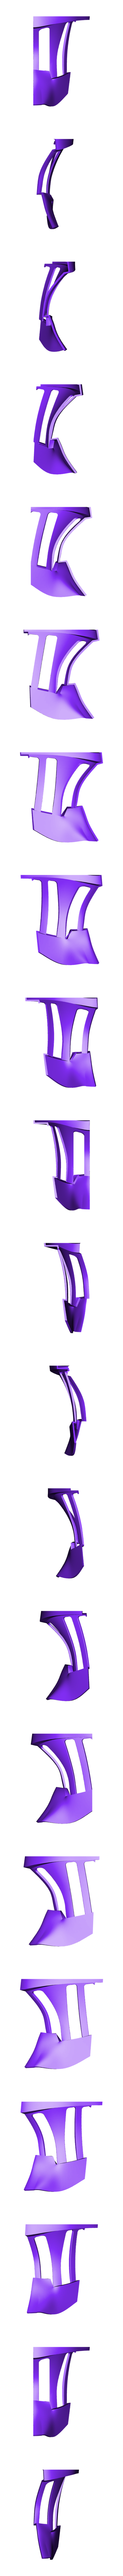 Part_7_v2_5.stl Download free STL file  Iron Musketeer's Helmet (Final Fantasy XI) • 3D printable design, VillainousPropShop